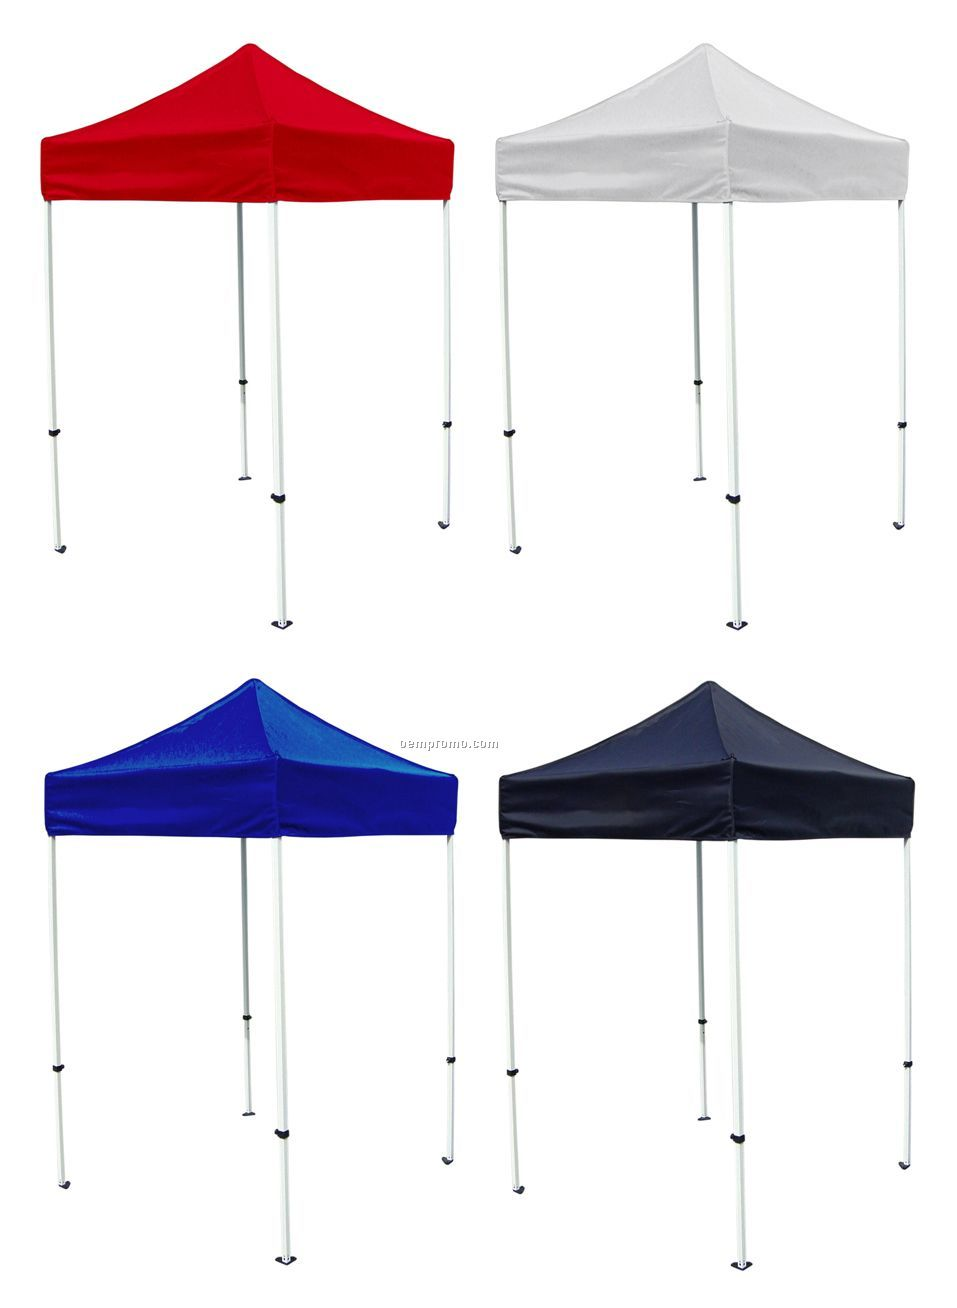 5x5 Pop Up Canopy Tent W/ Steel Frame (No Art)